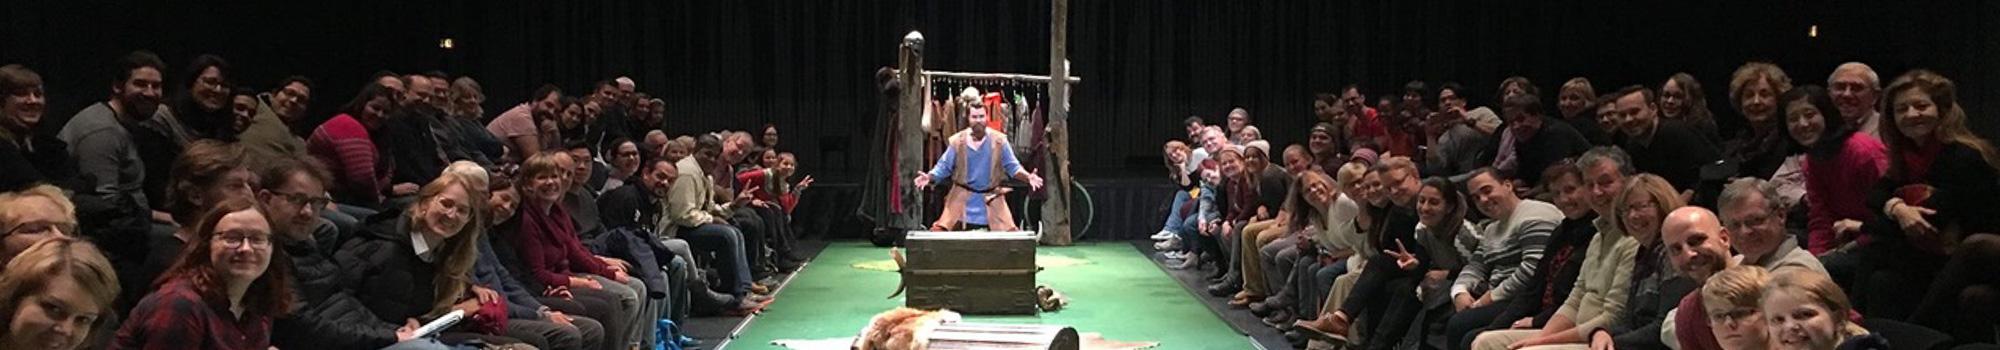 Icelandic Saga show